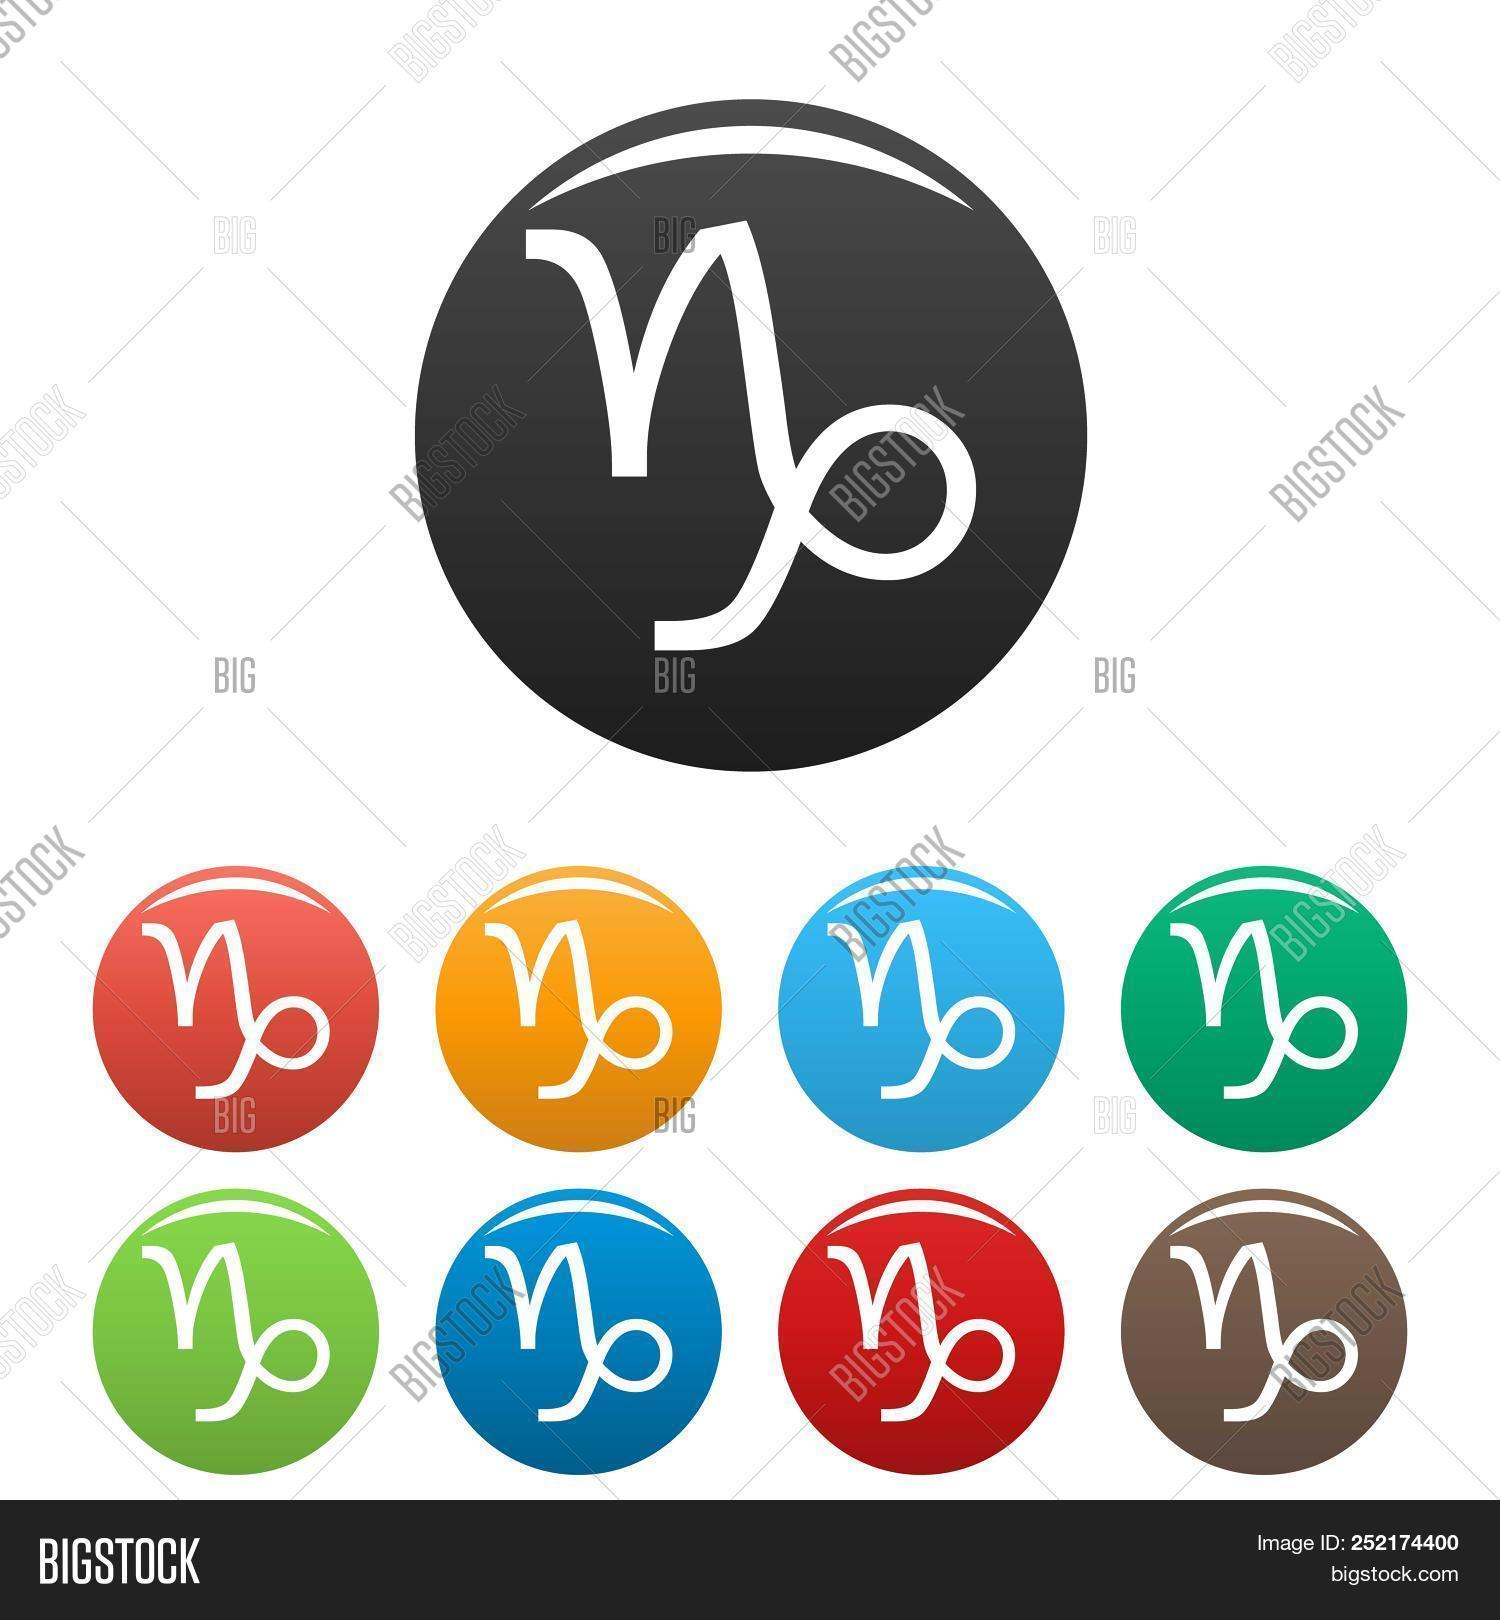 Capricorn Zodiac Sign Icons Set Simple Illustration Of Capricorn